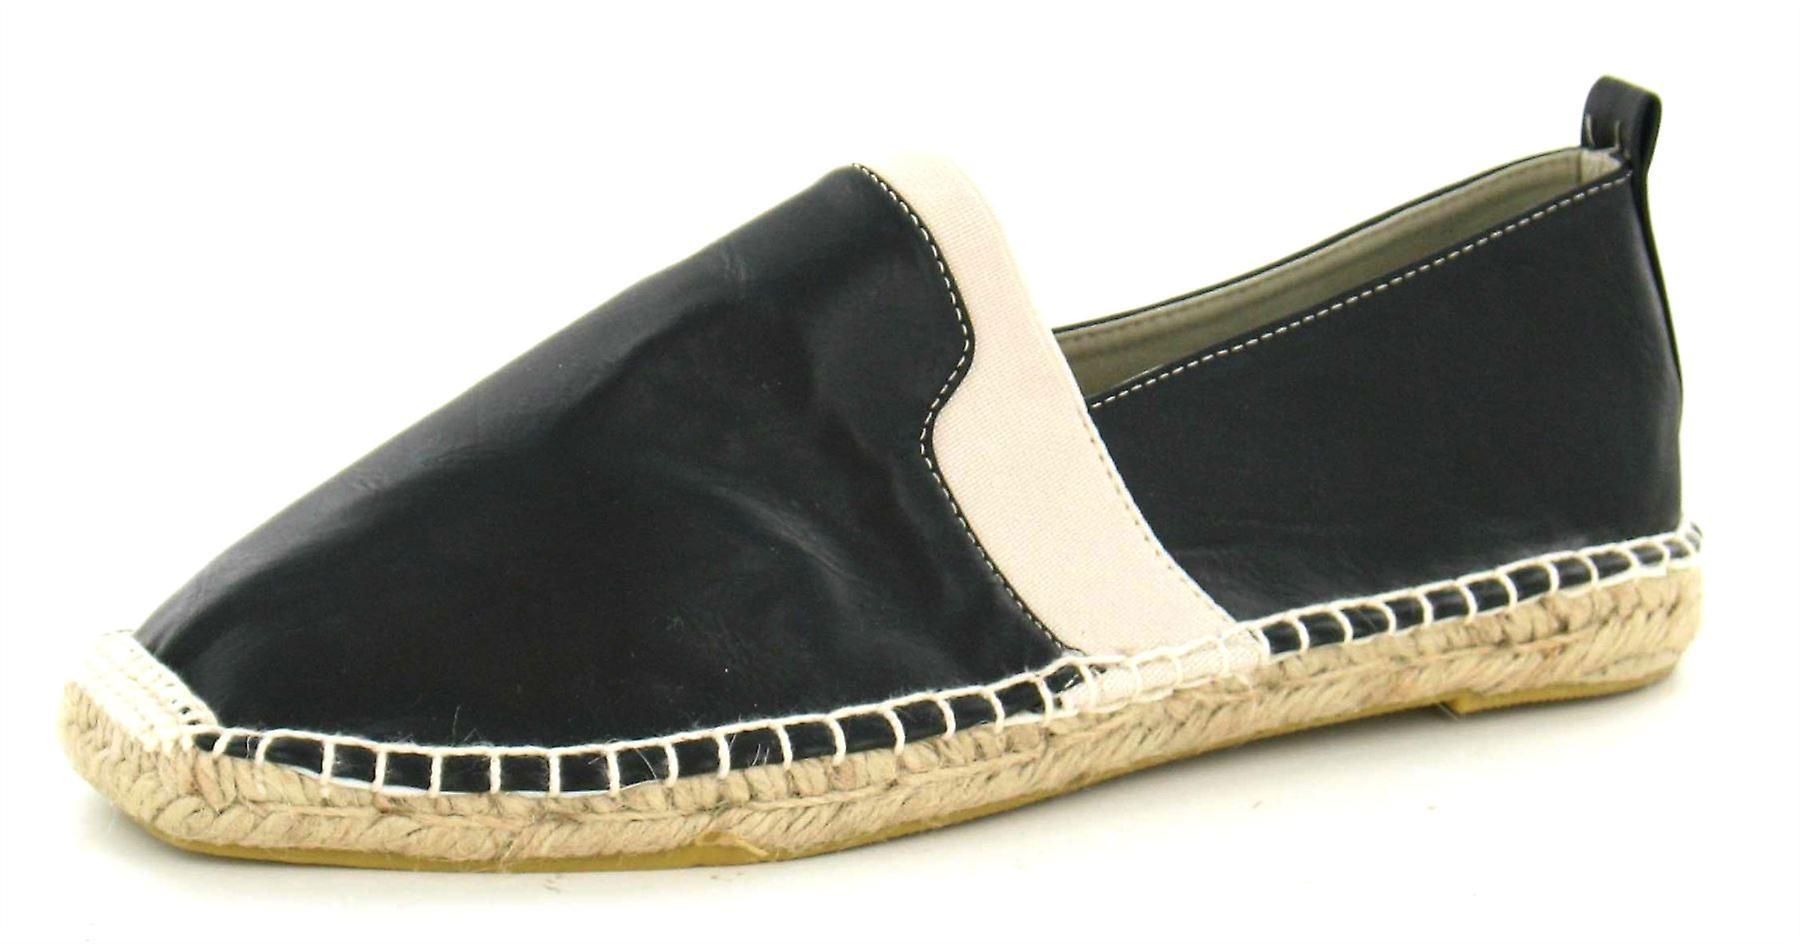 Mens Fleck auf flache Schuhe